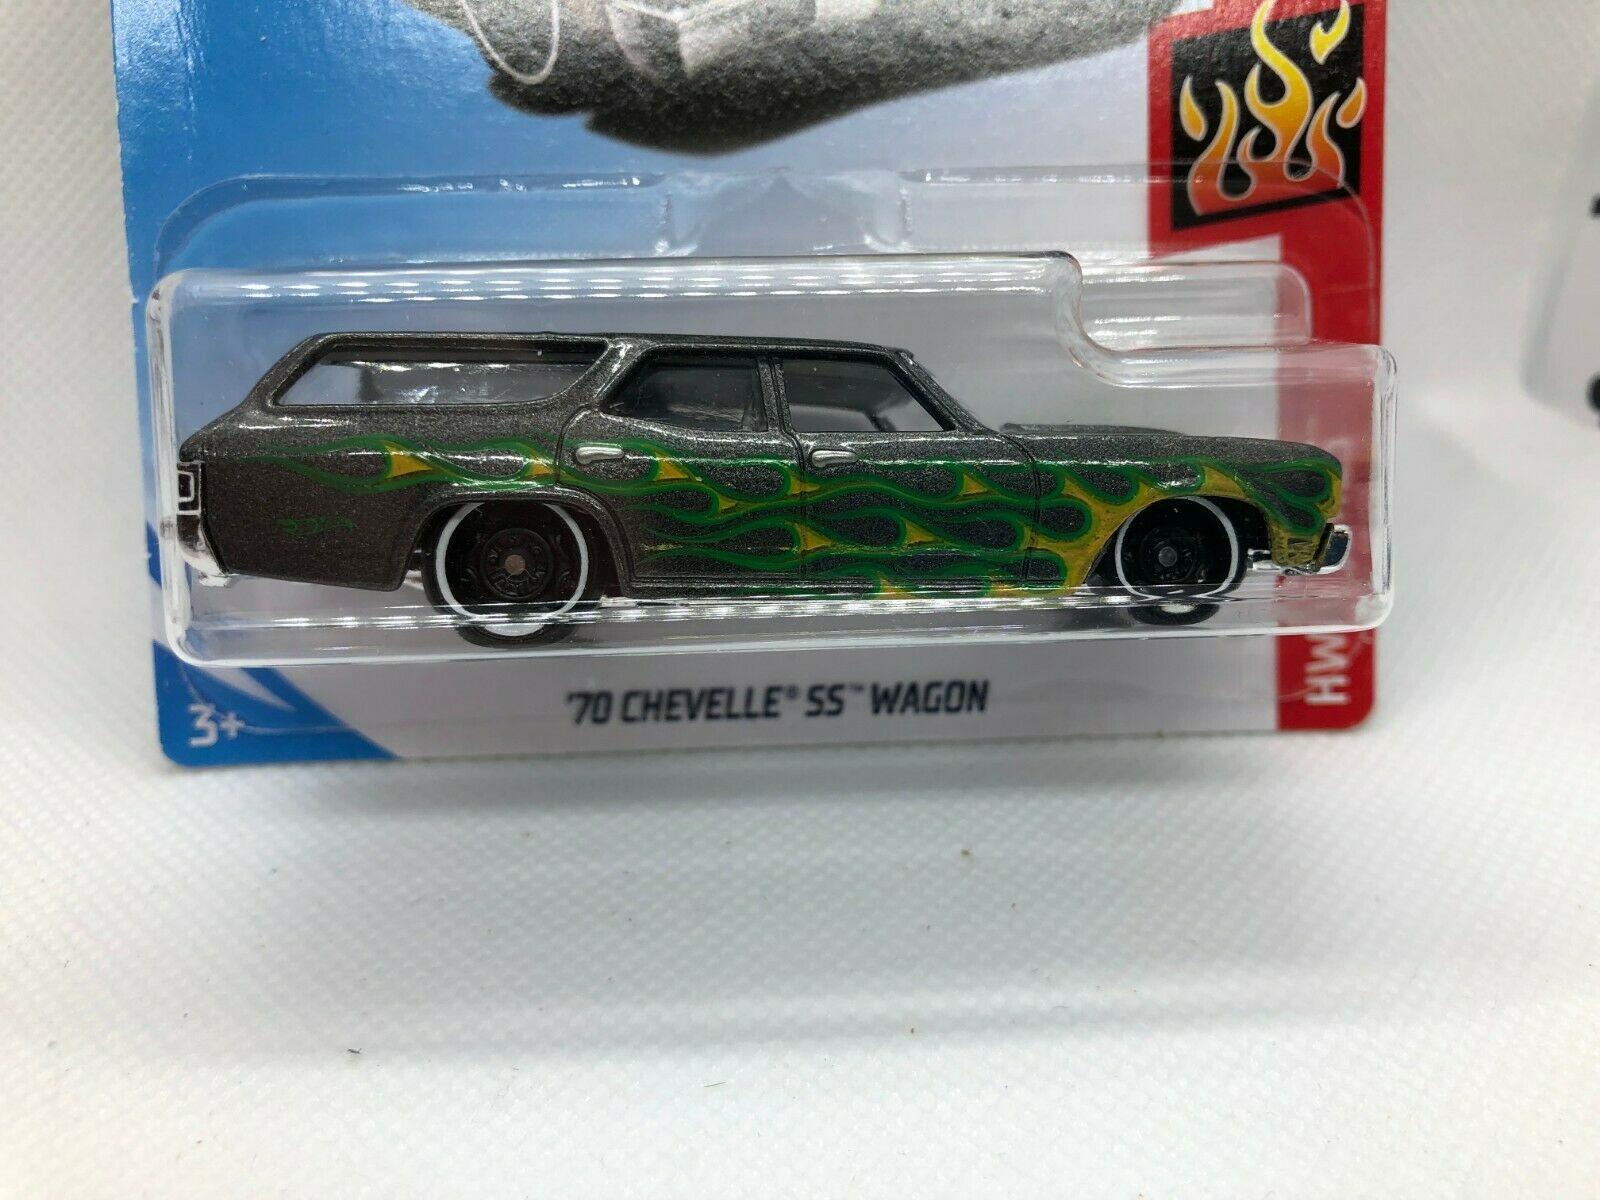 70 Chevelle SS Wagon